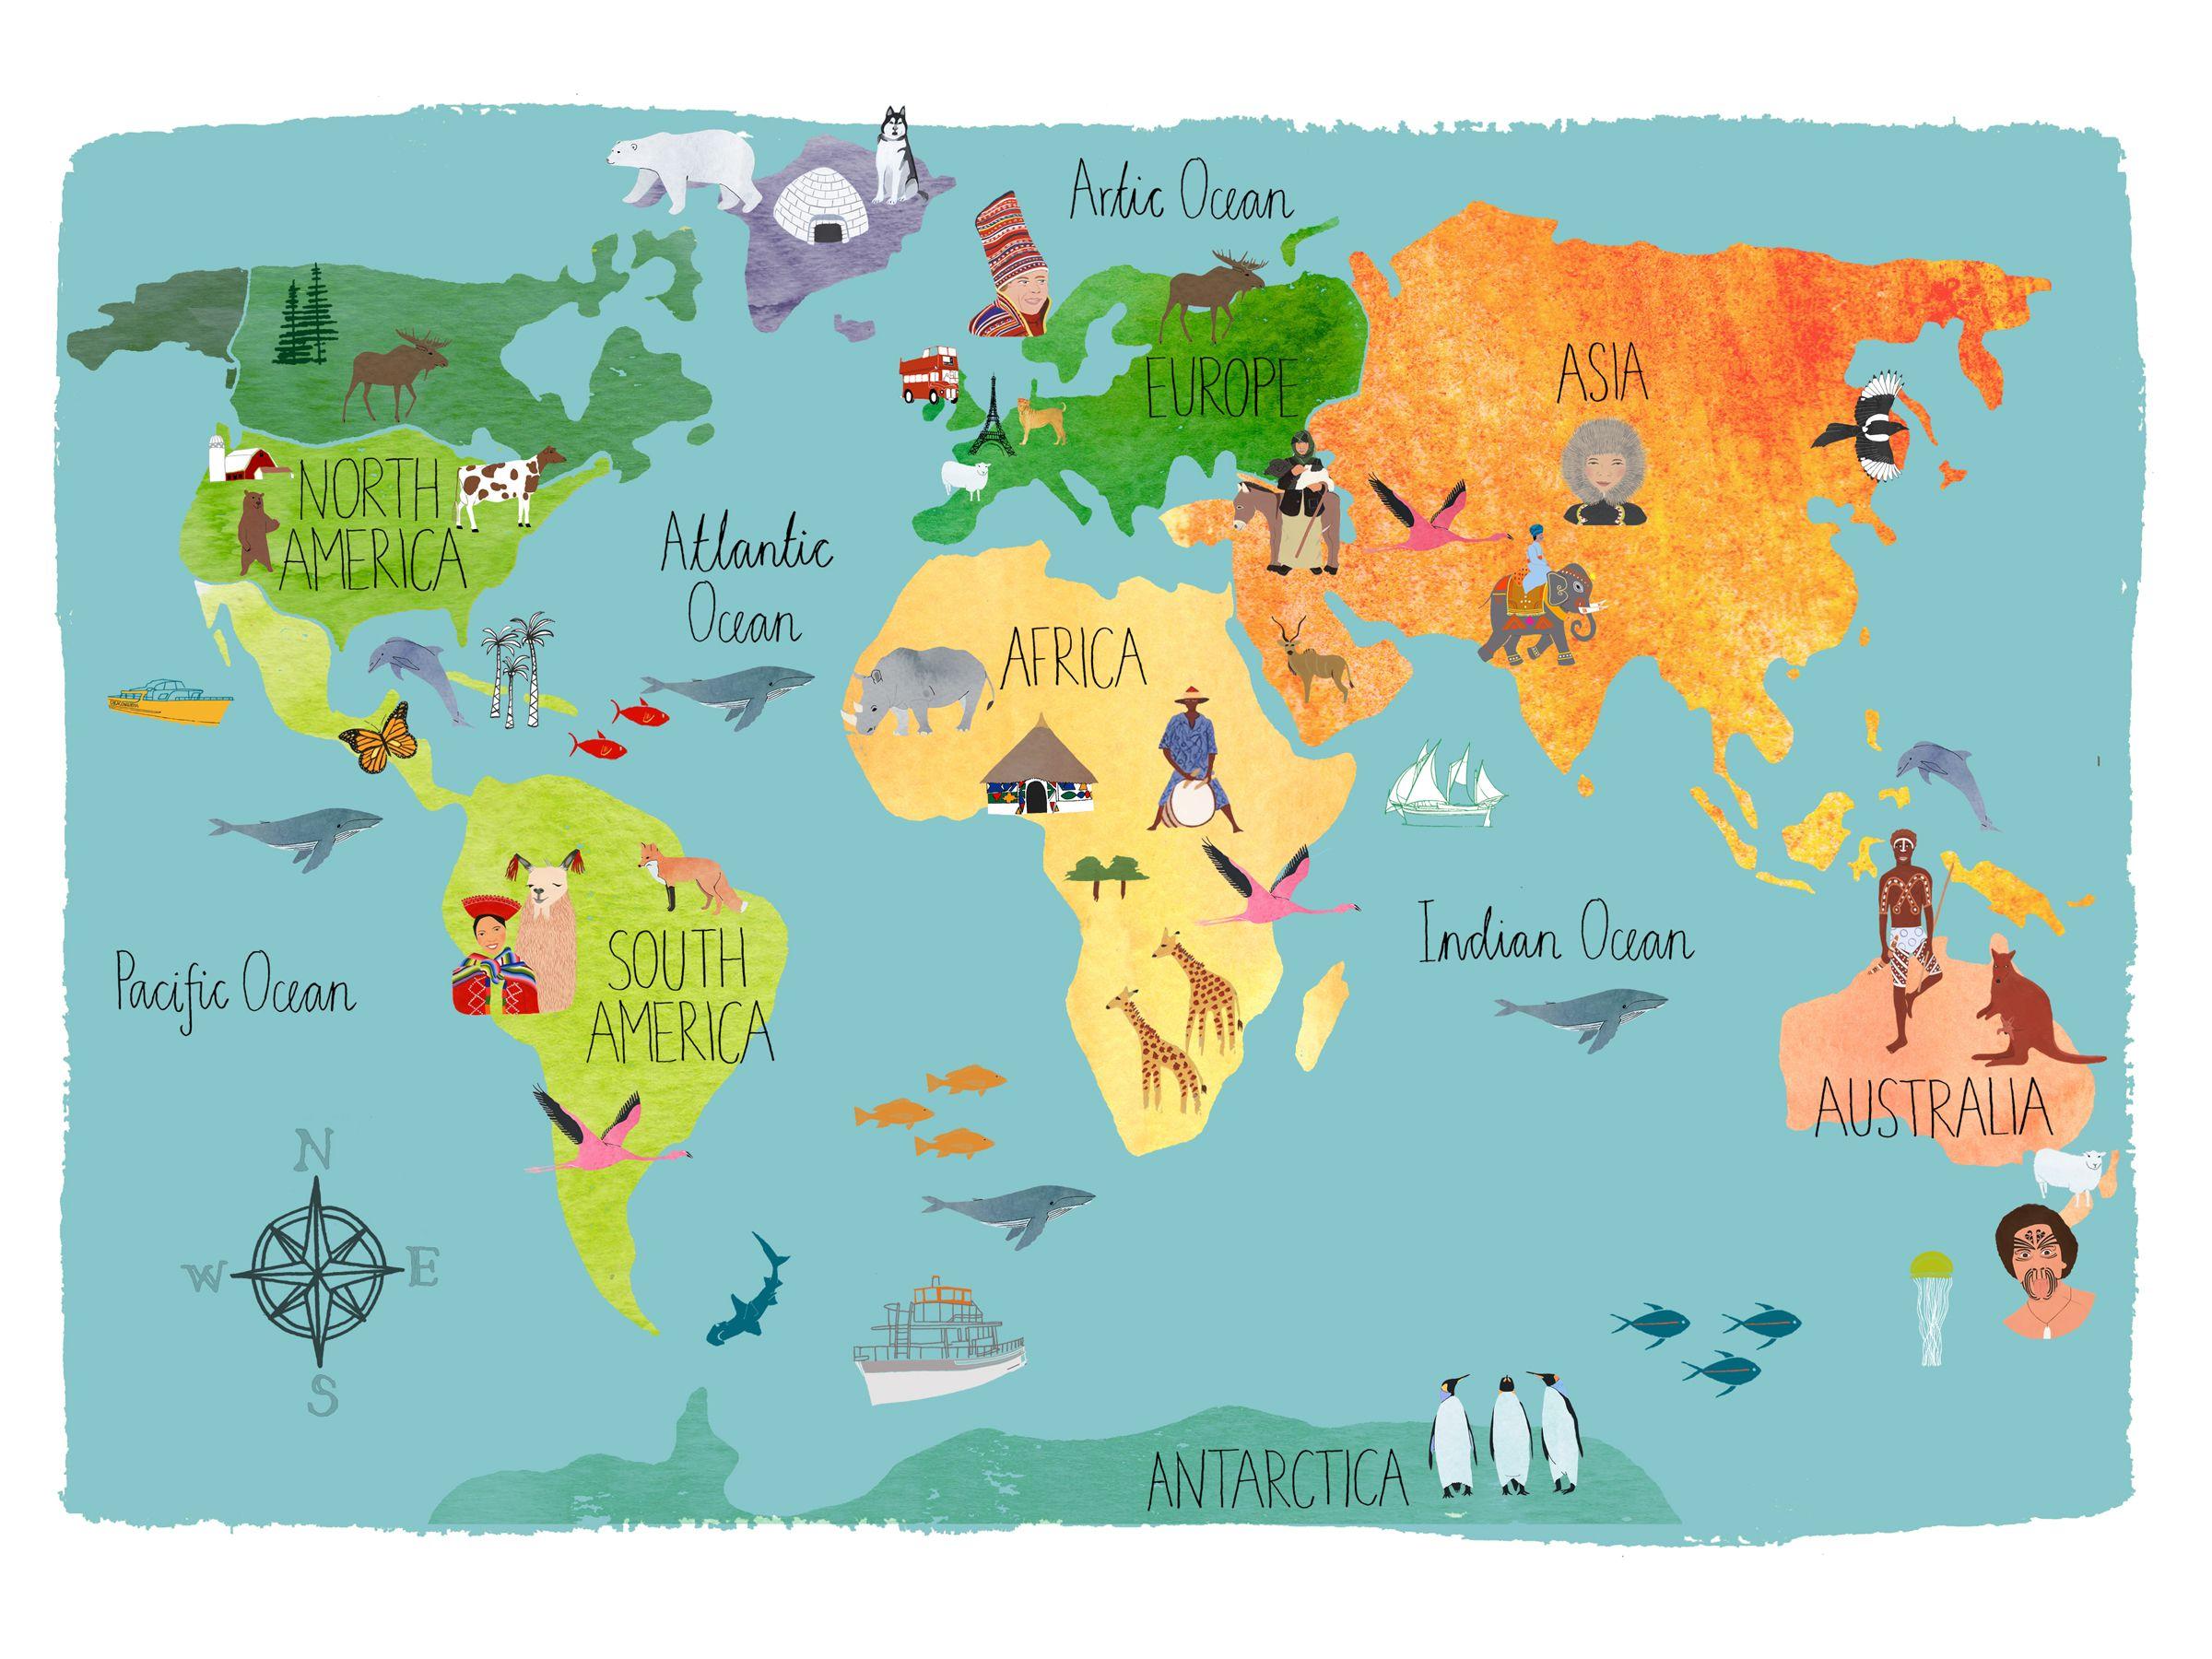 Illustrated World Map by Dangerdom - Dribbble